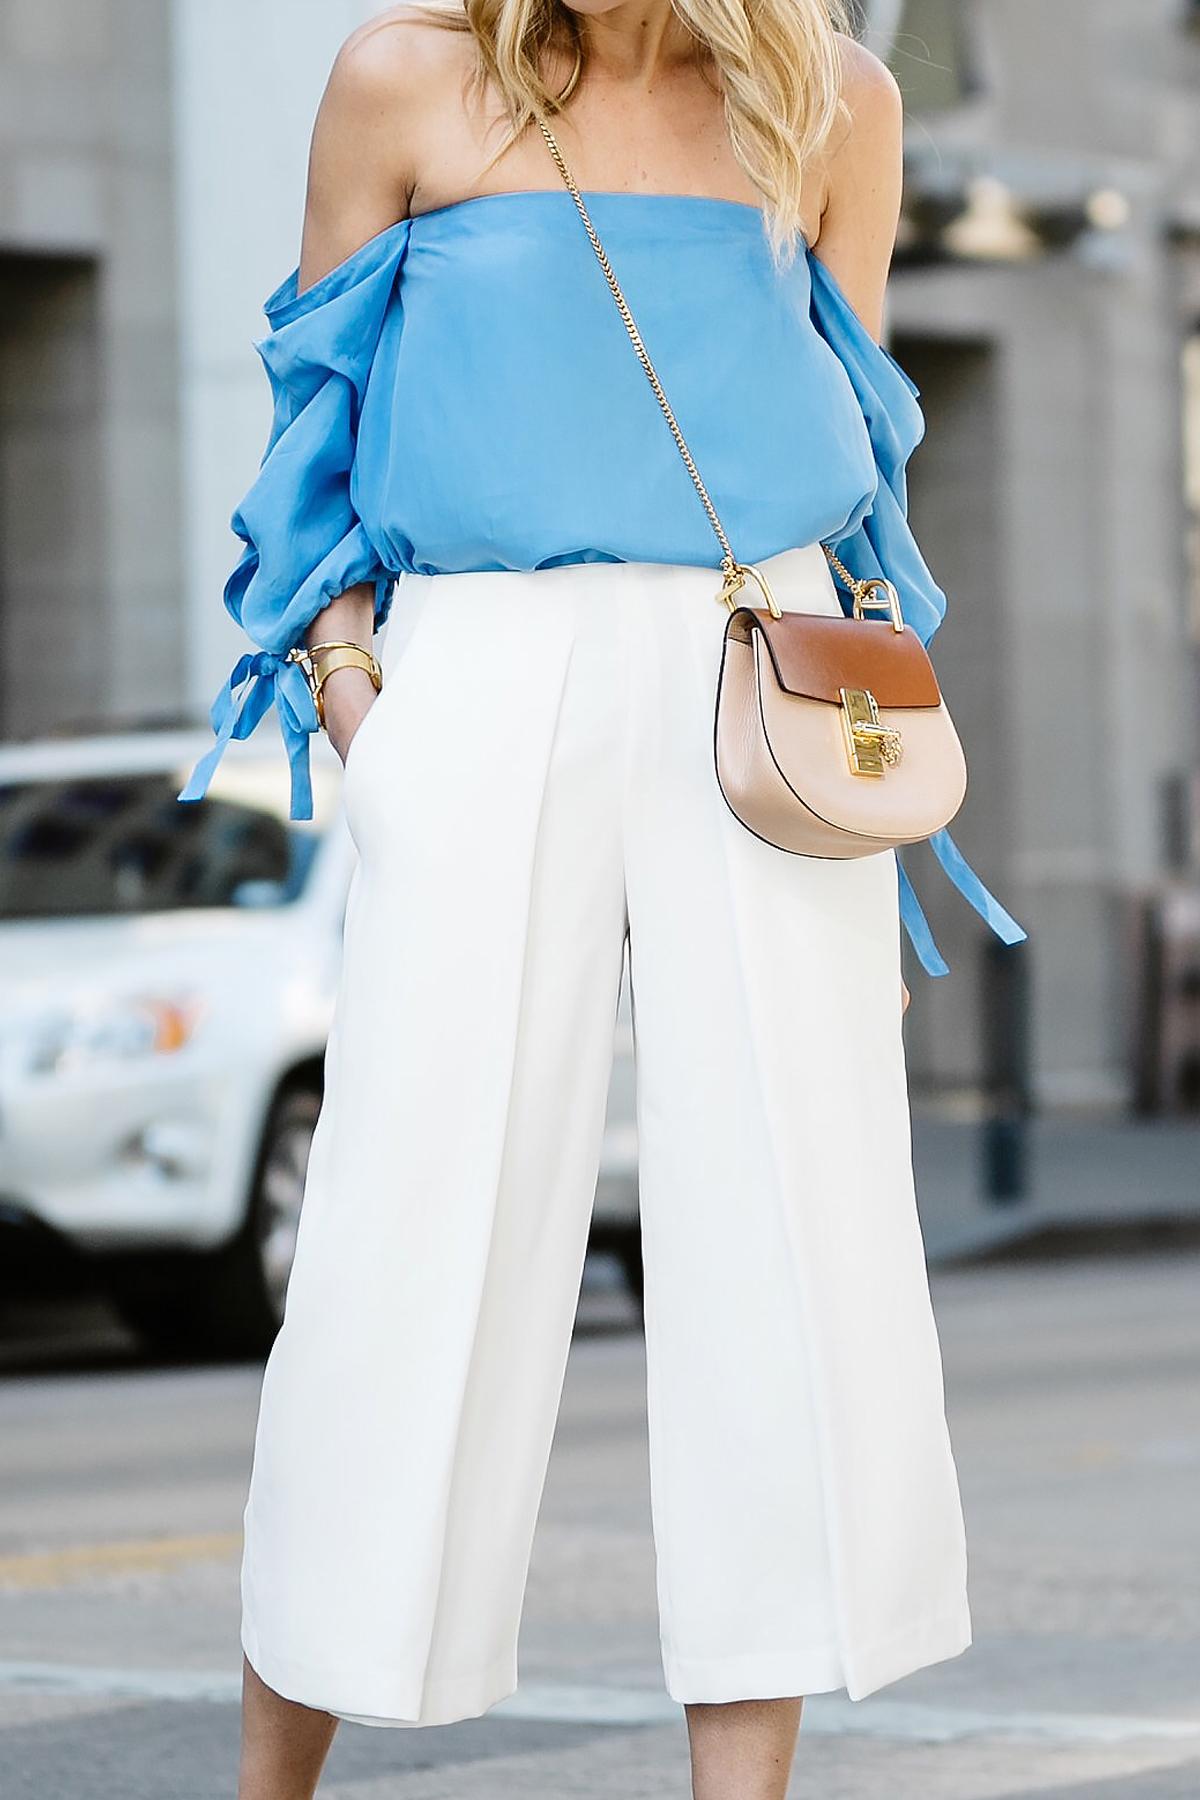 Fashion Jackson, Dallas Blogger, Fashion Blogger, Street Style, Club Monaco Liki Top, Blue Off-the-Shoulder Top, White Culottes, Chloe Drew Handbag